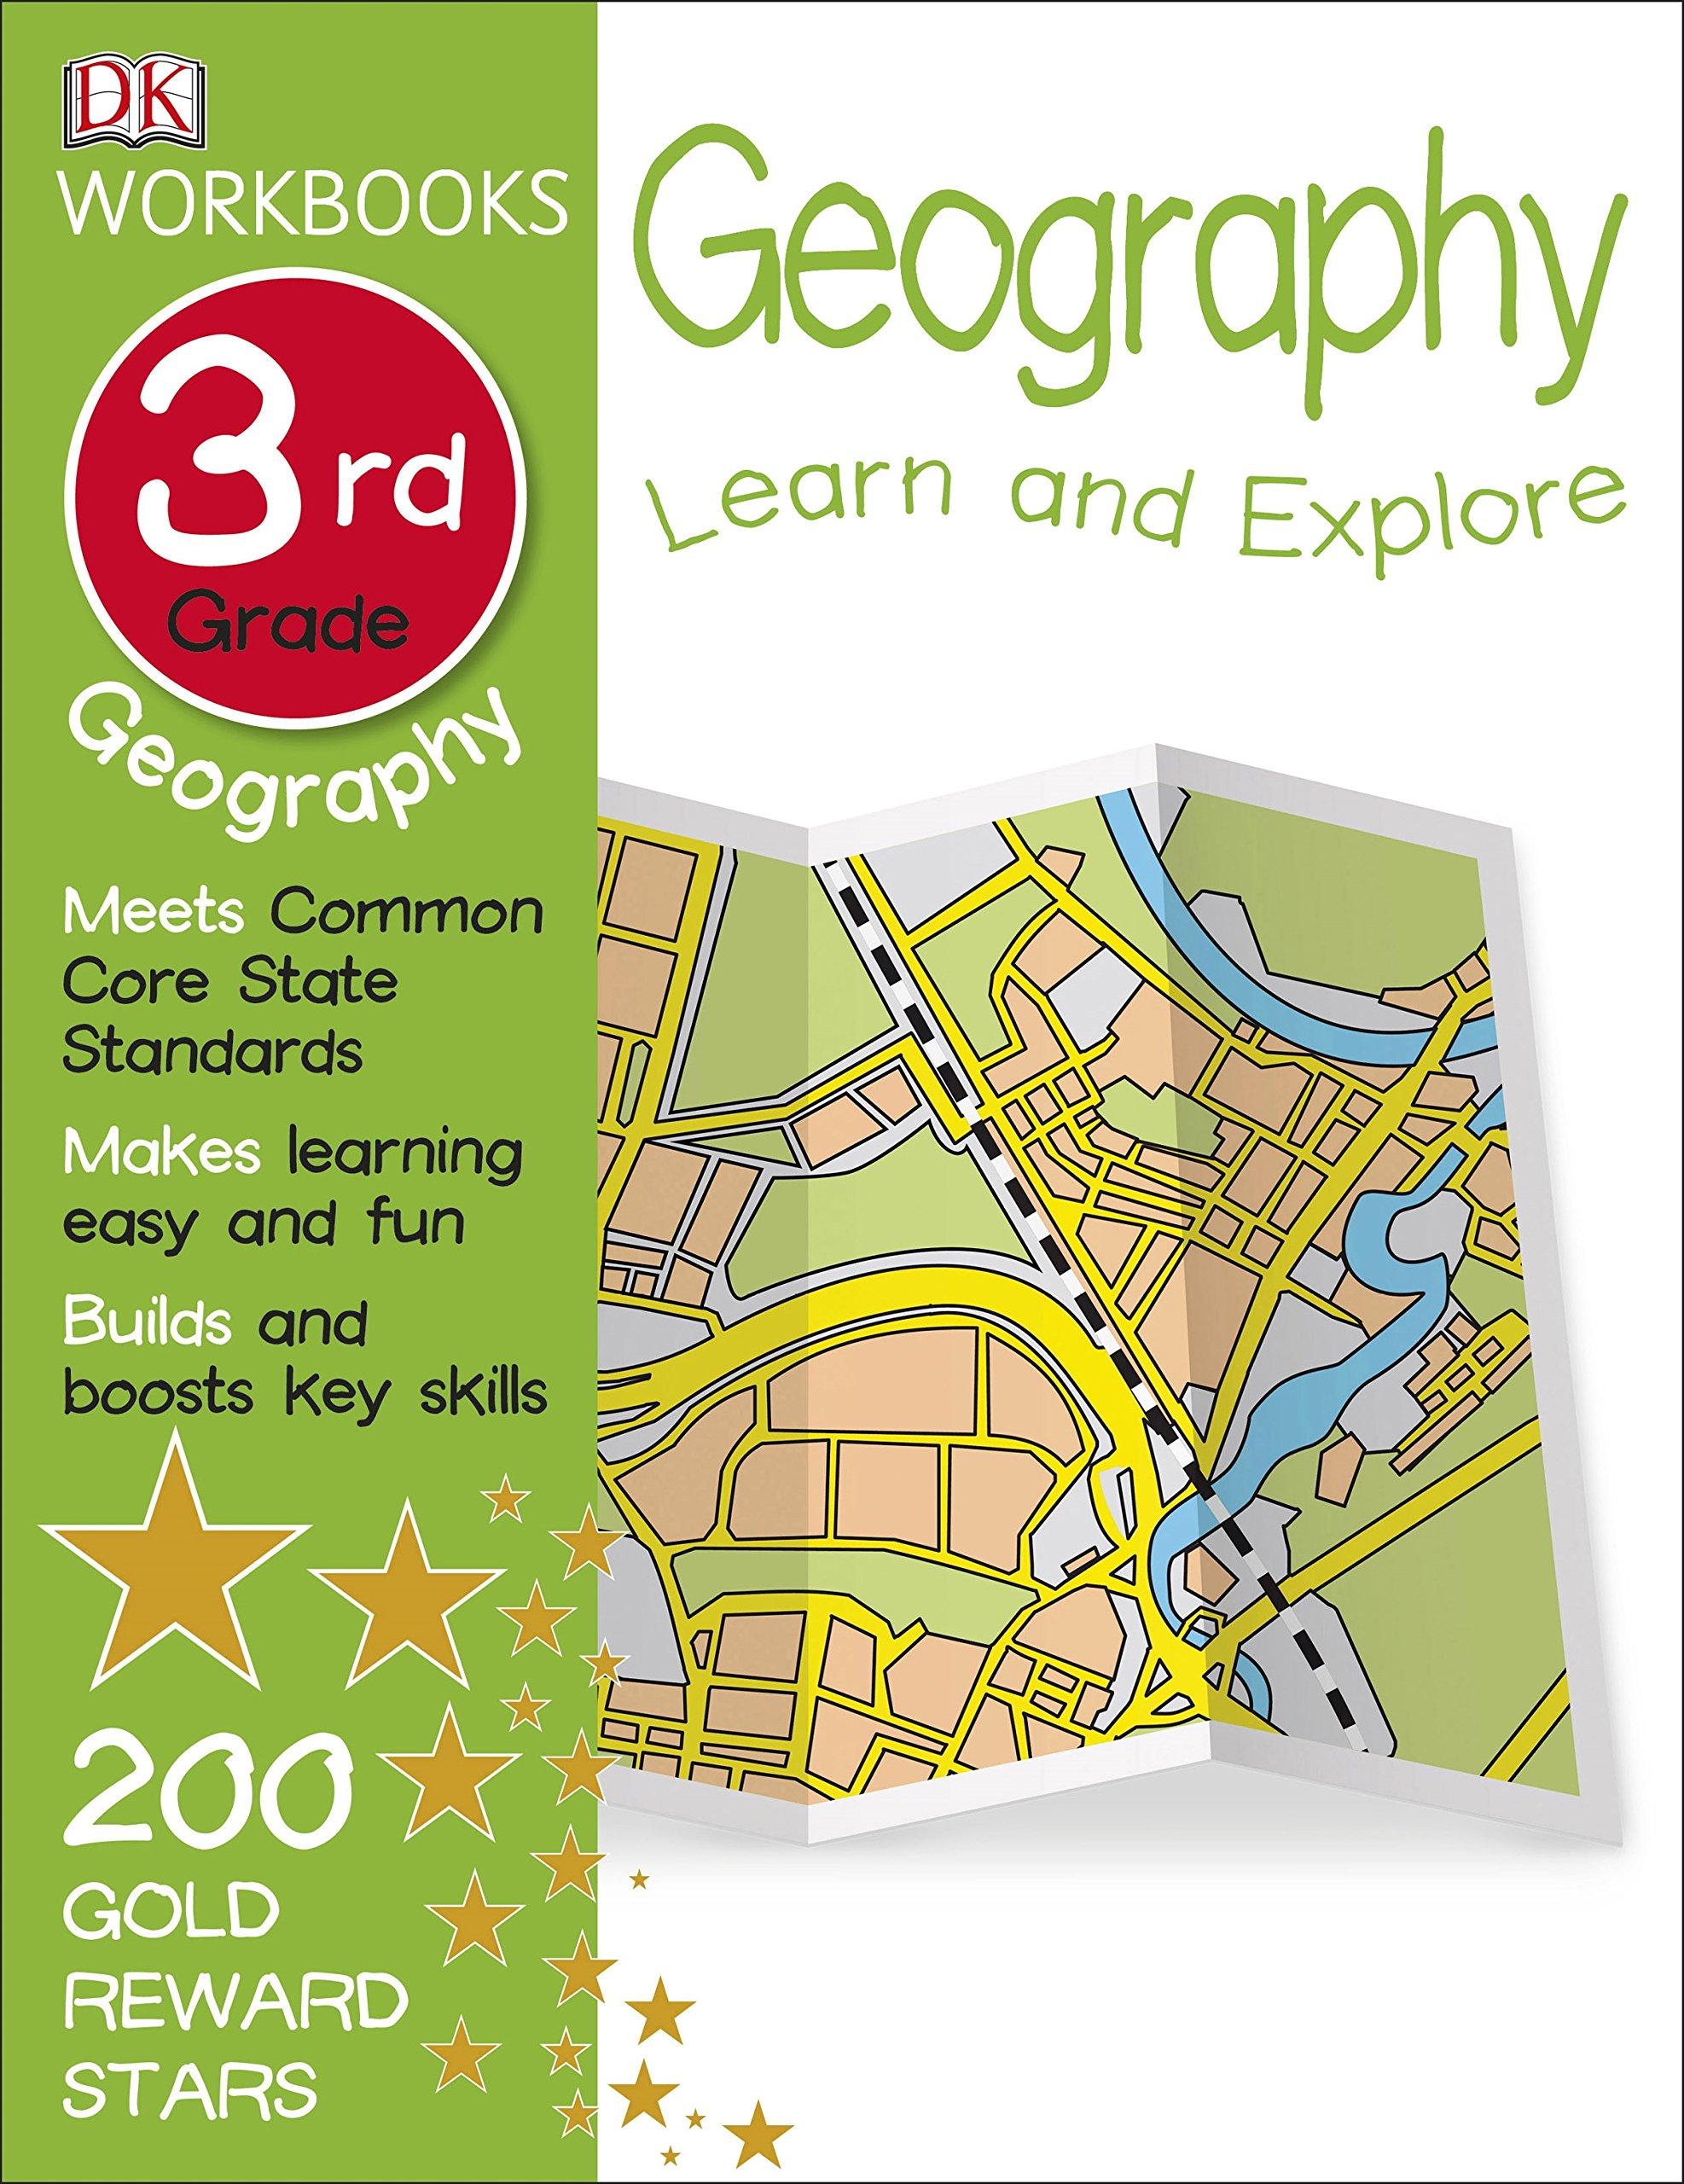 DK Workbooks: Geography, Third Grade: DK: 0790778028497: Amazon.com ...